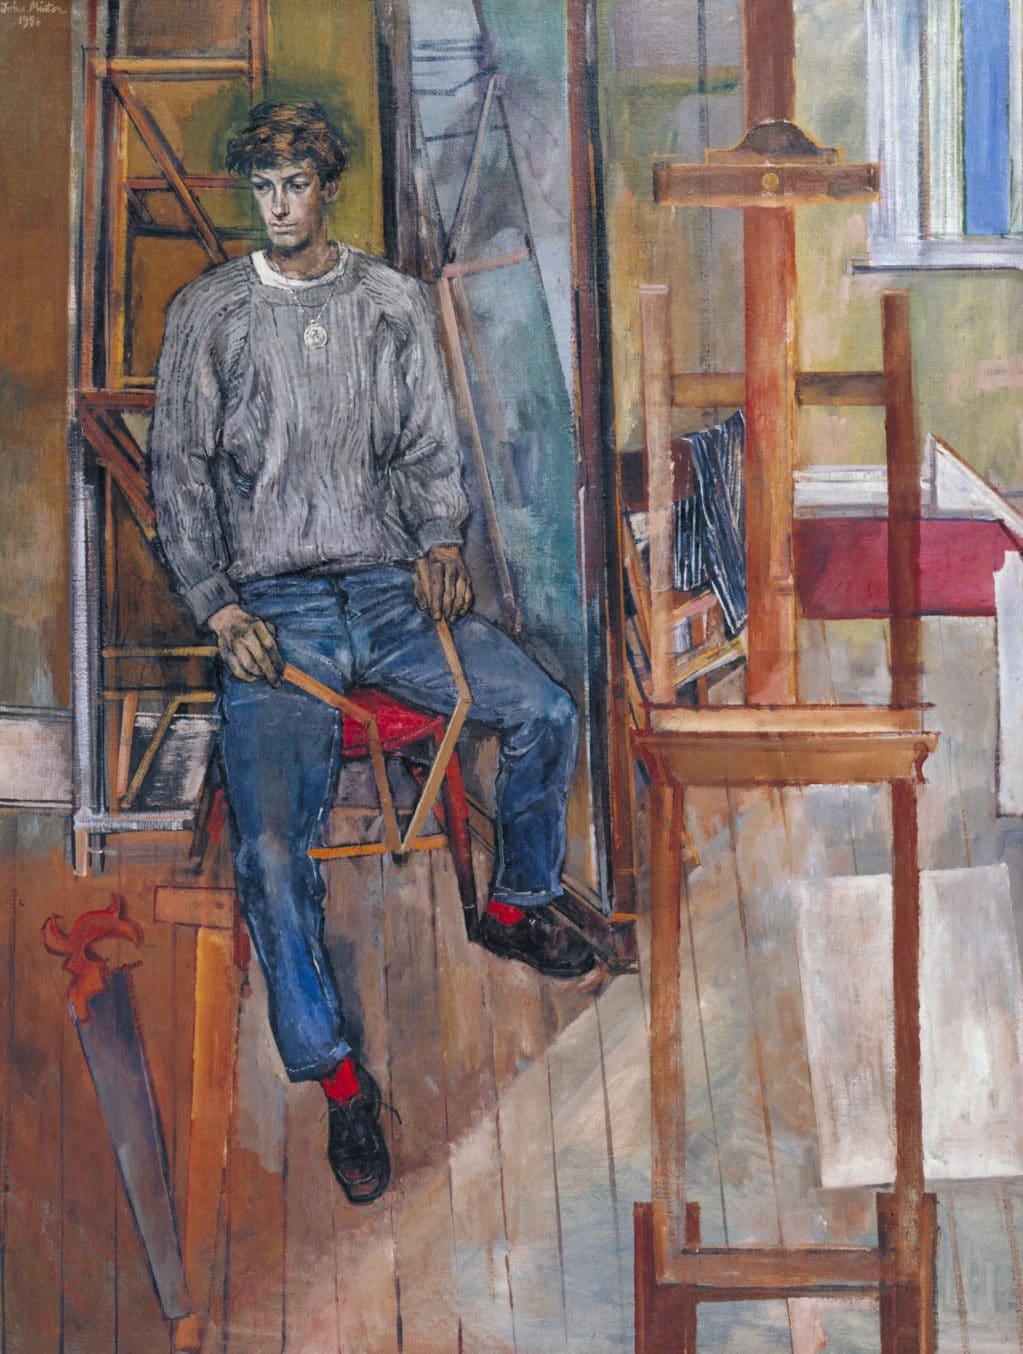 John Minton, portrait